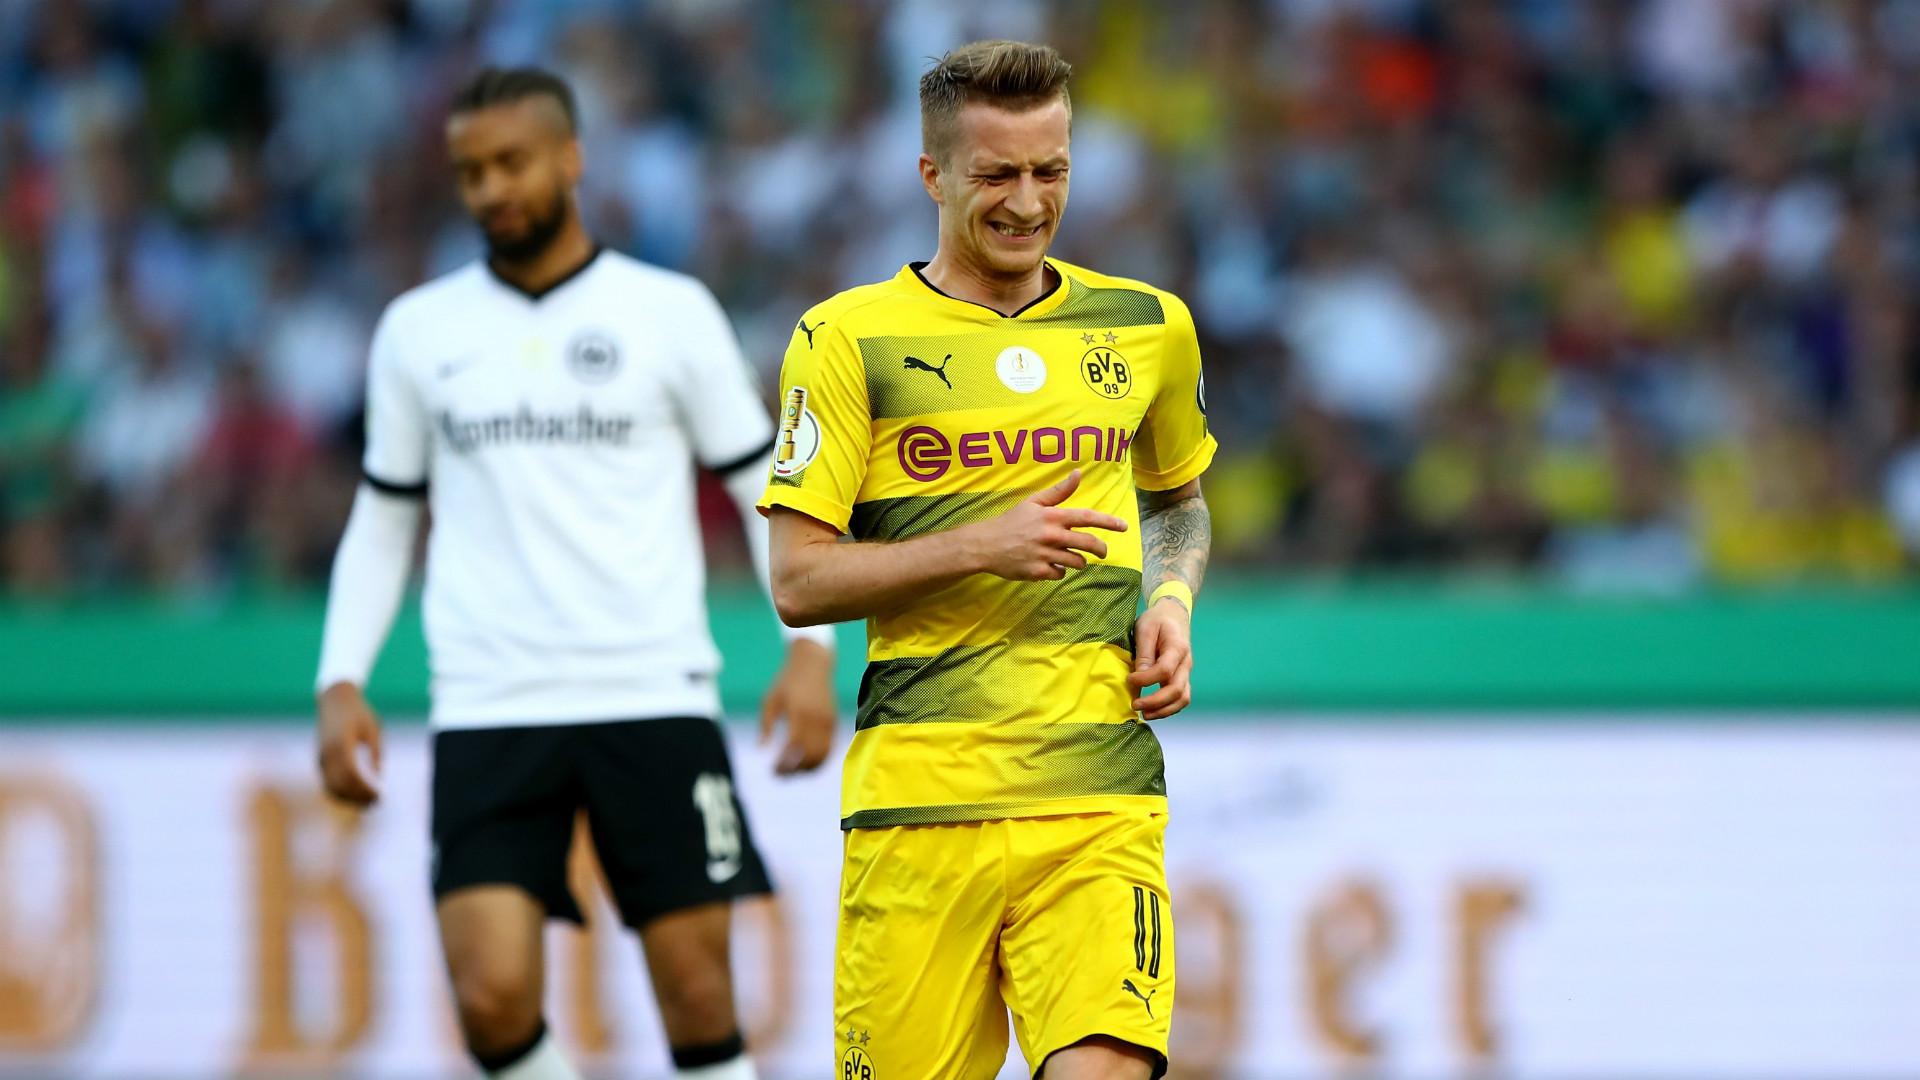 Marco Reus Says He's Considering Leaving Borussia Dortmund in 2019